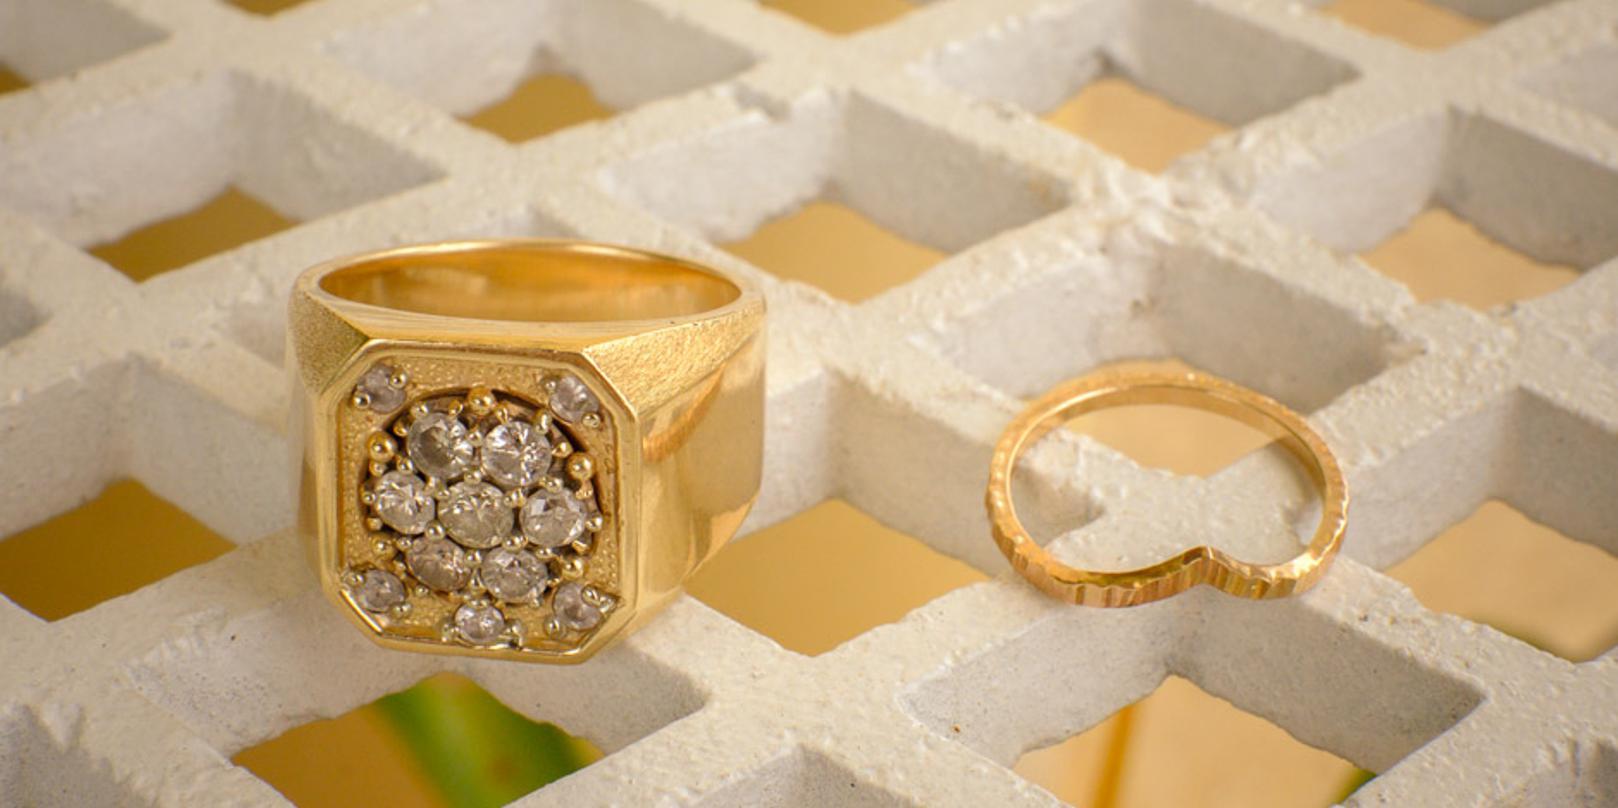 bodas-sin-clasificar-sin-tema-cuba-41021.jpg